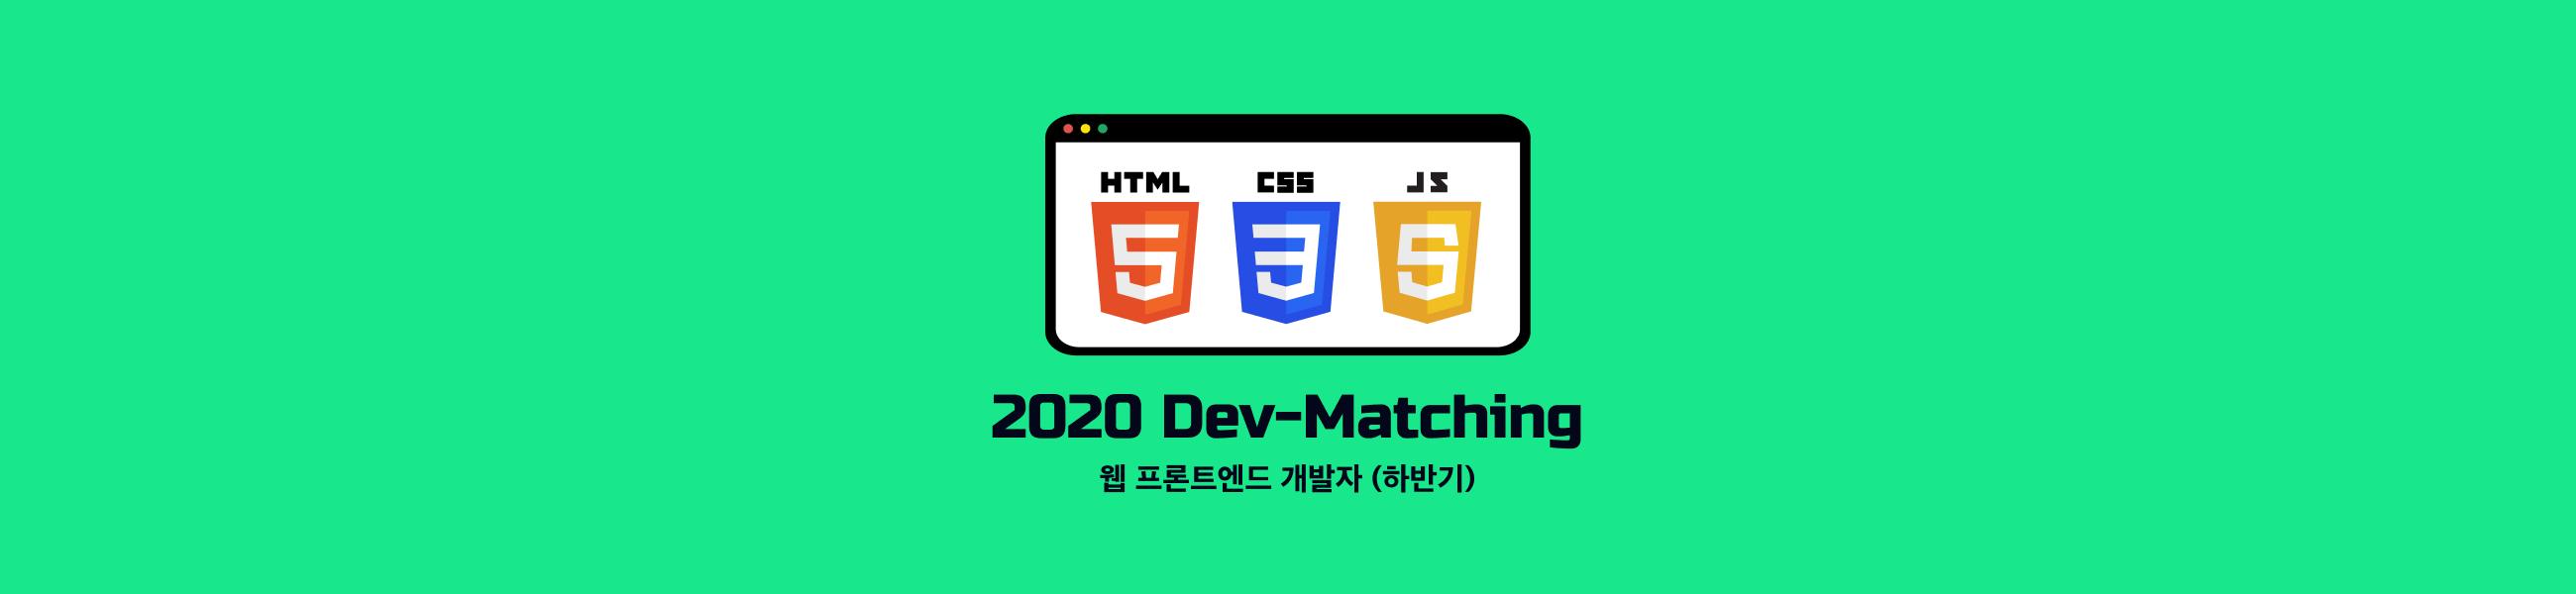 2020 Dev-Matching: 웹 프론트엔드 개발자(하반기)의 이미지